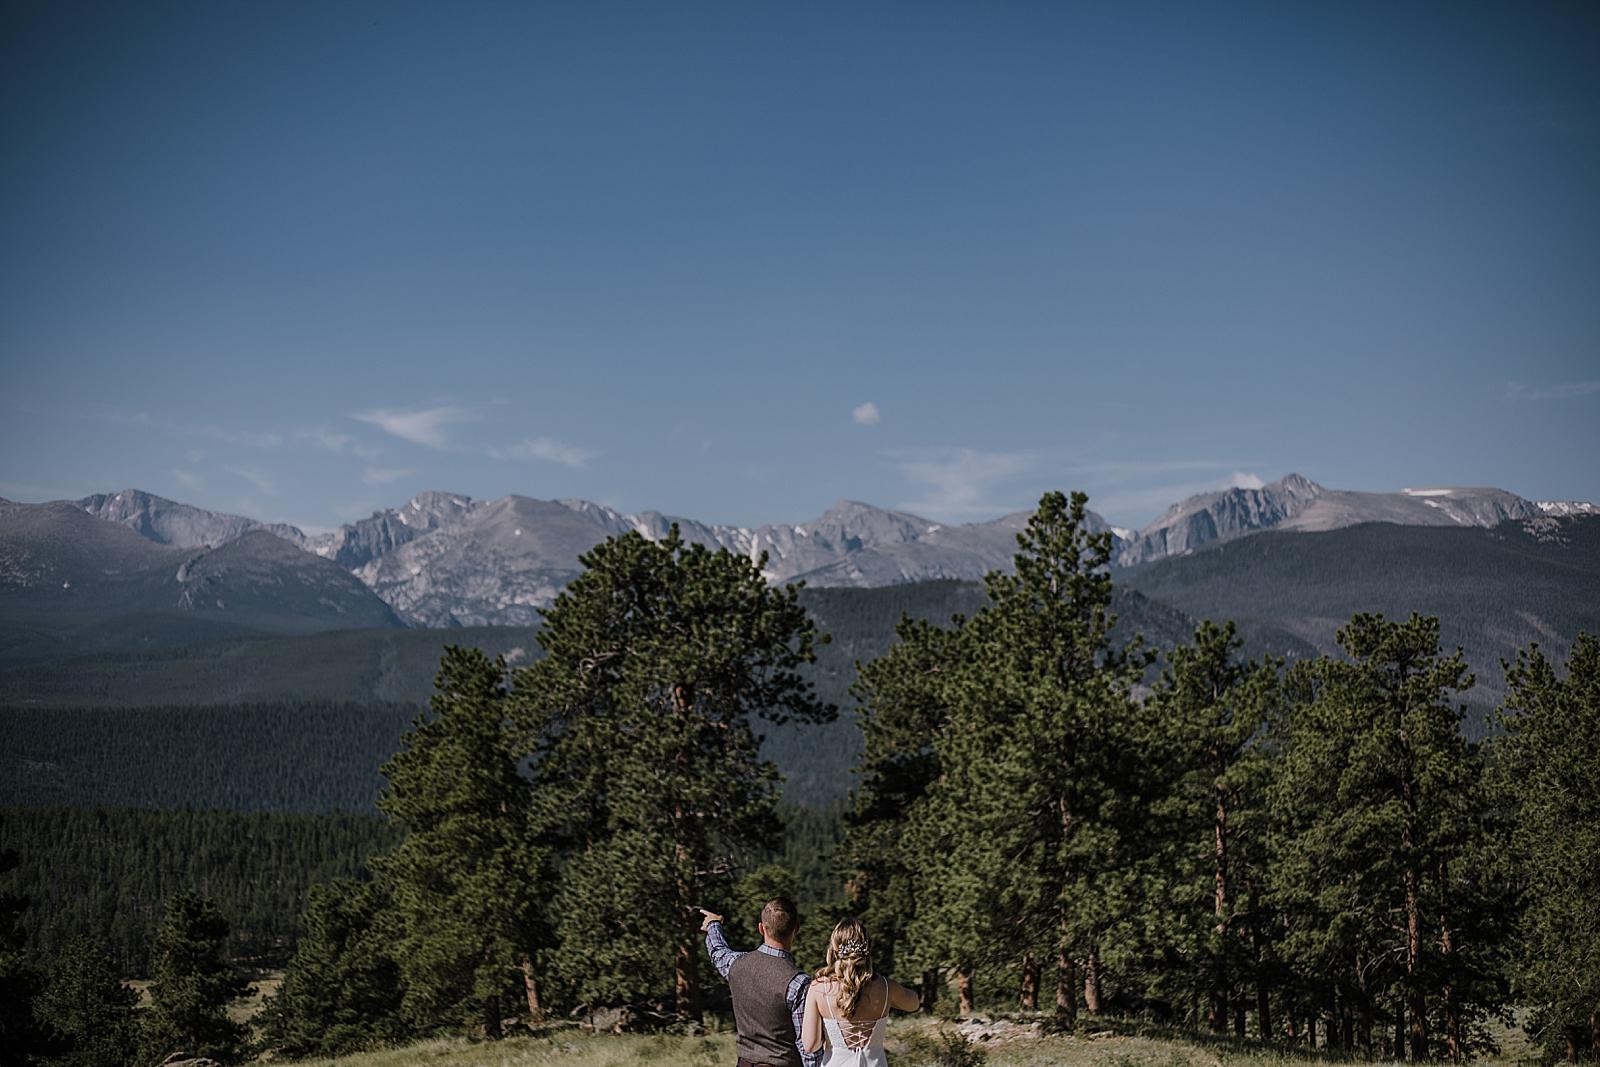 elopement couple hiking in RMNP, rocky mountain national park elopement, 3M curves elopement, self solemnizing, self solemnization, long's peak ceremony, hiking elopement, estes park elopement